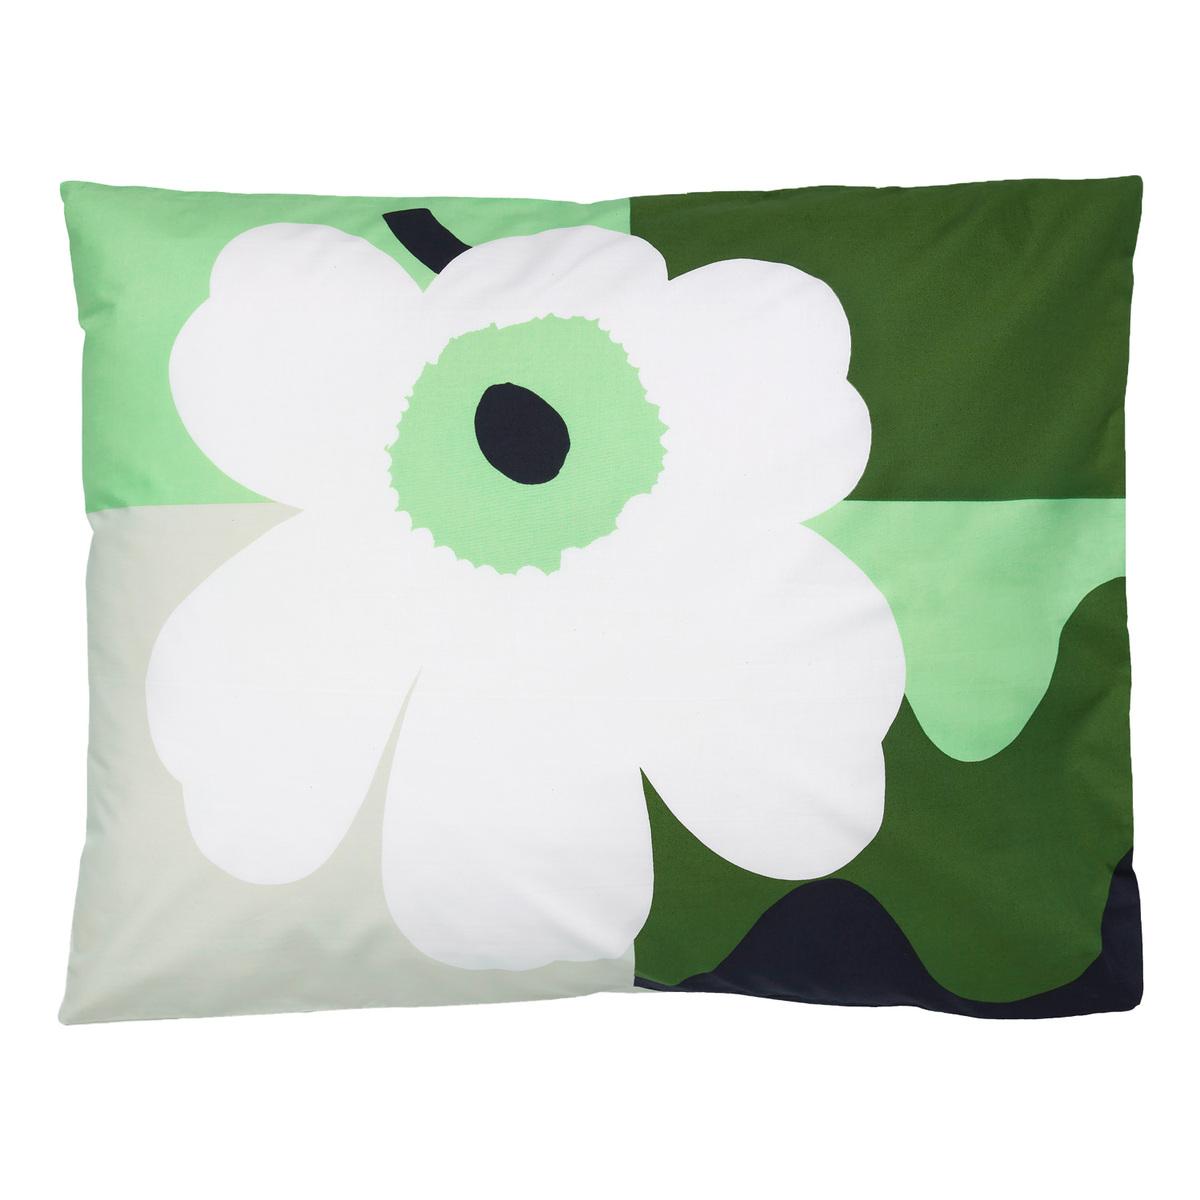 Marimekko Co-Created Pillowcase 50 X 60 Cm, Green - White